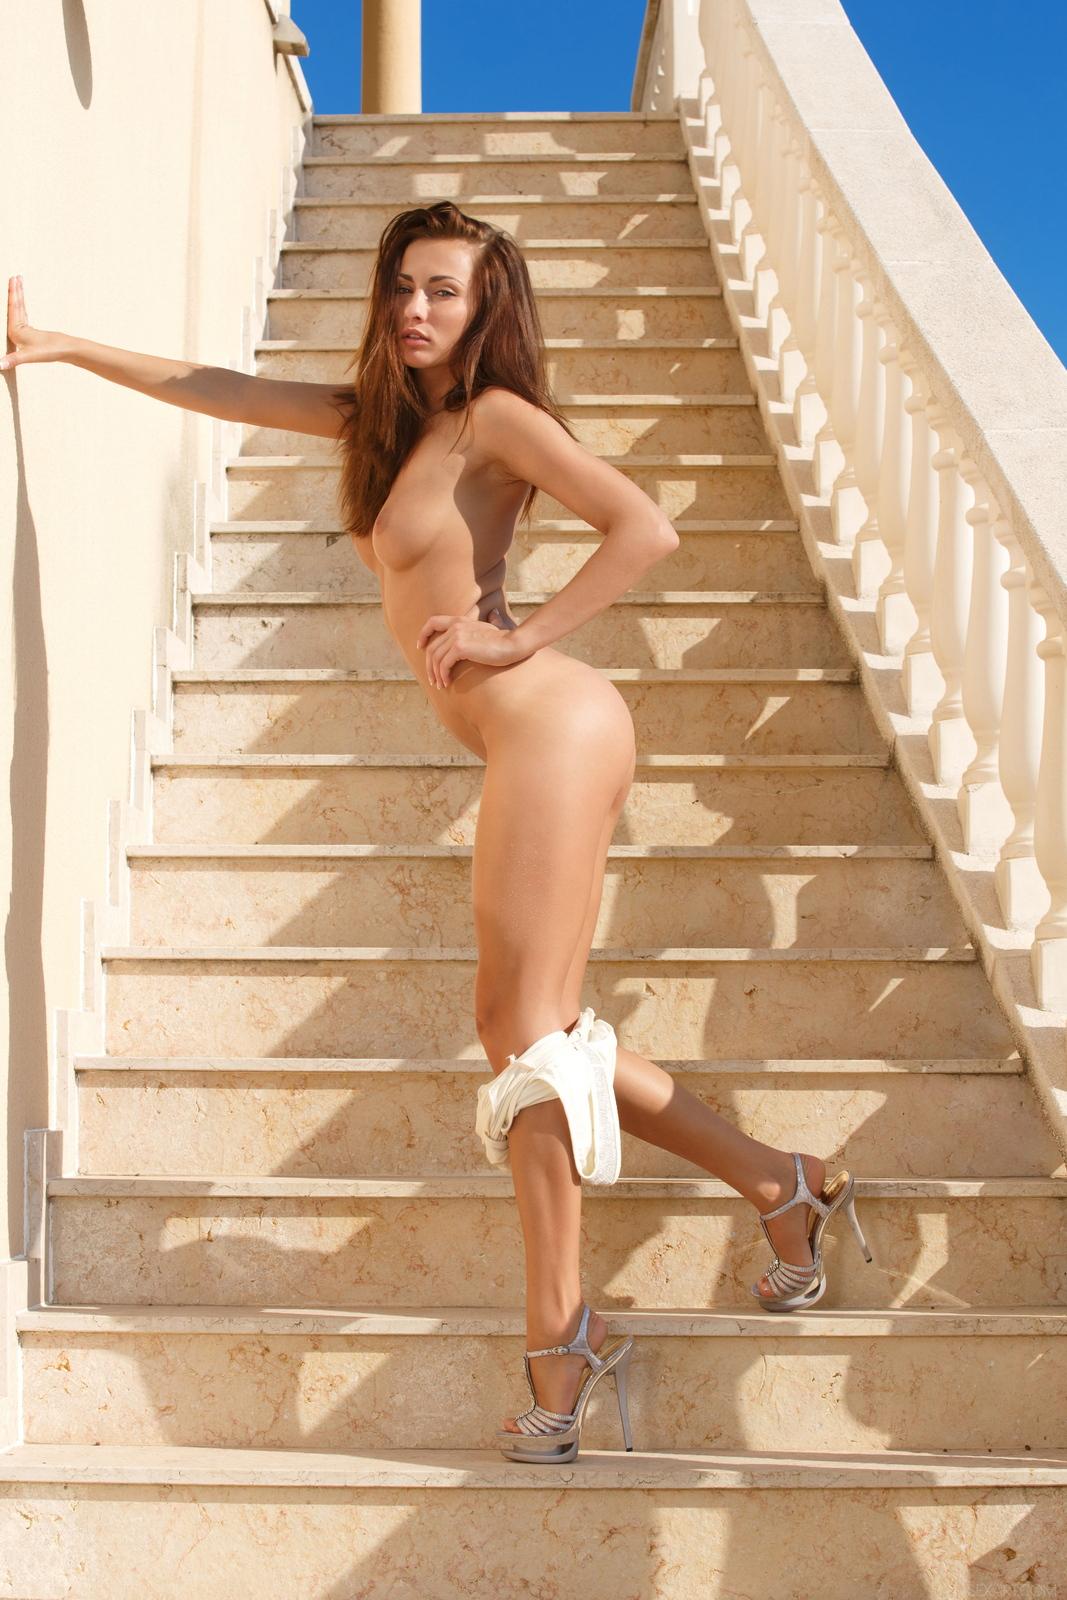 michaela-isizzu-stairs-high-heels-naked-sexart-16